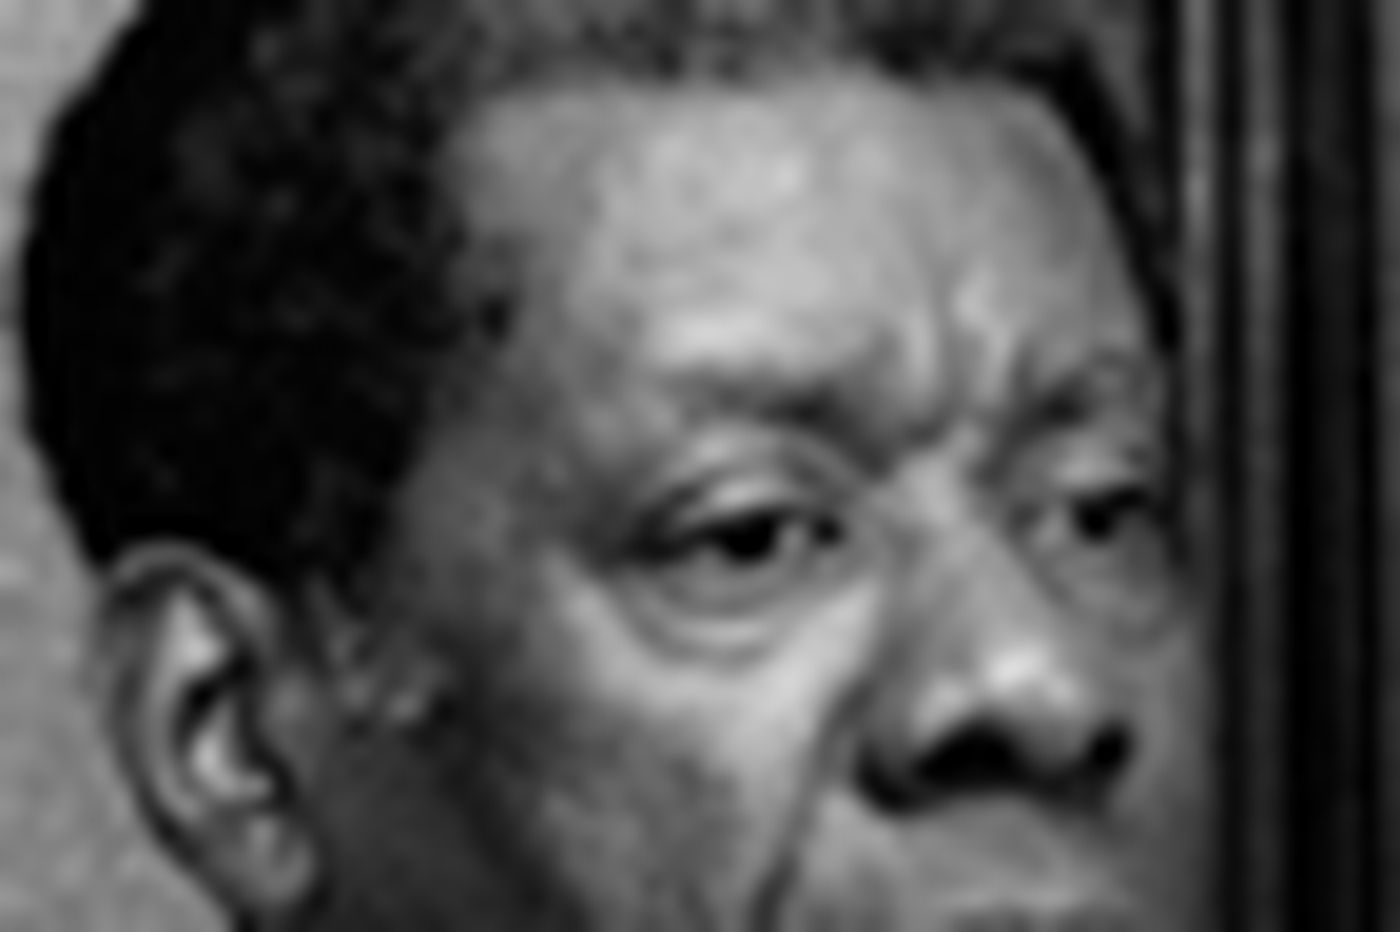 Jesse Hill Jr. | Atlanta civil rights leader, 86